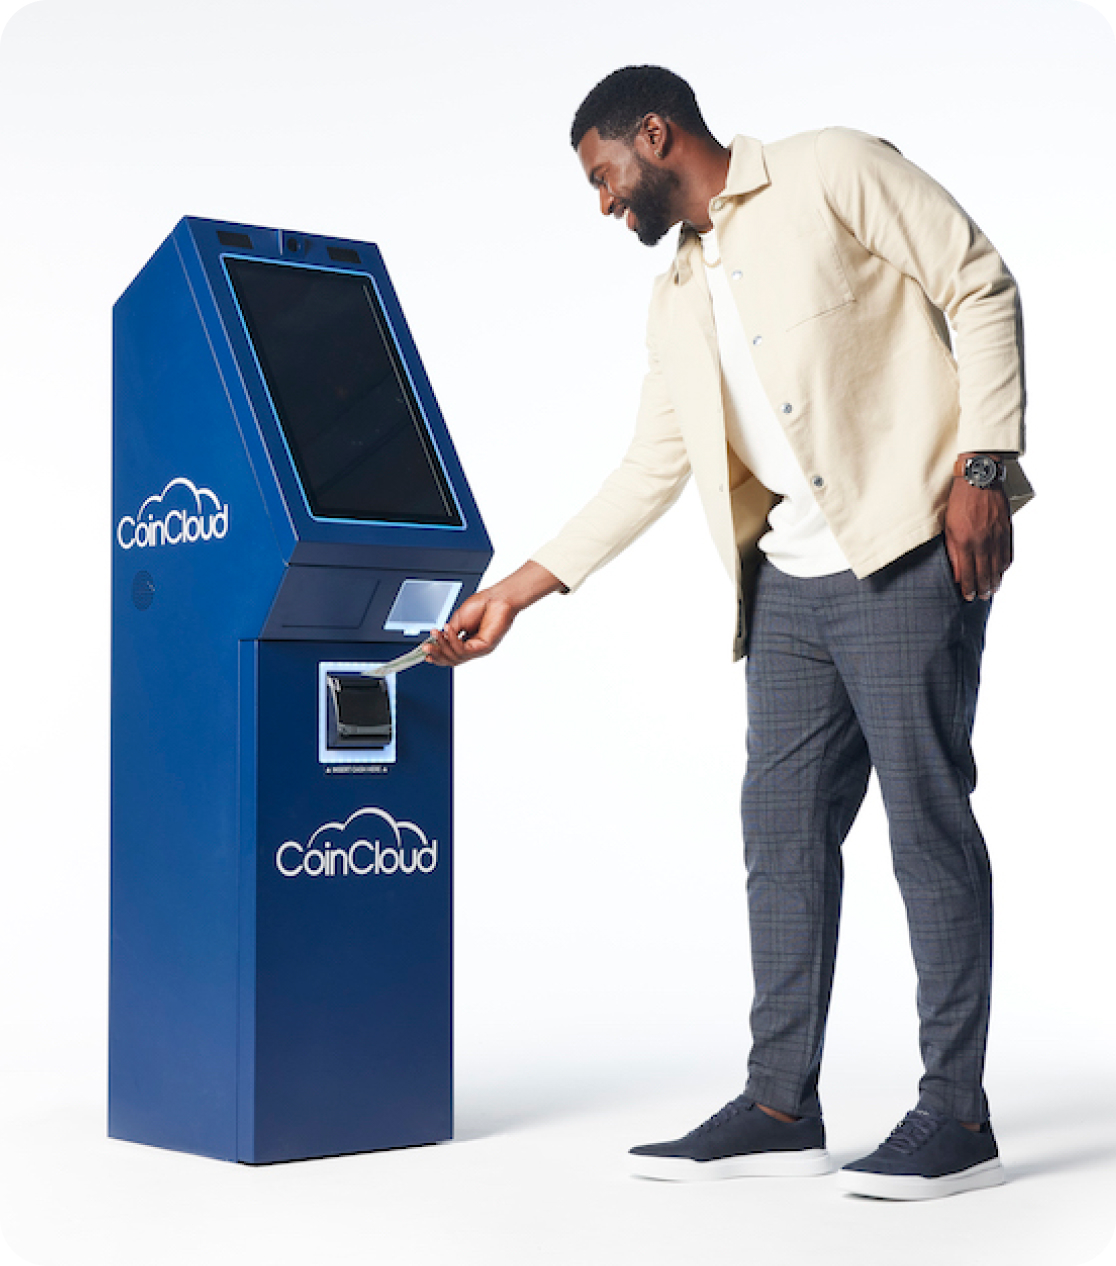 Man feeding money into a Coin Cloud digital currency machine kiosk